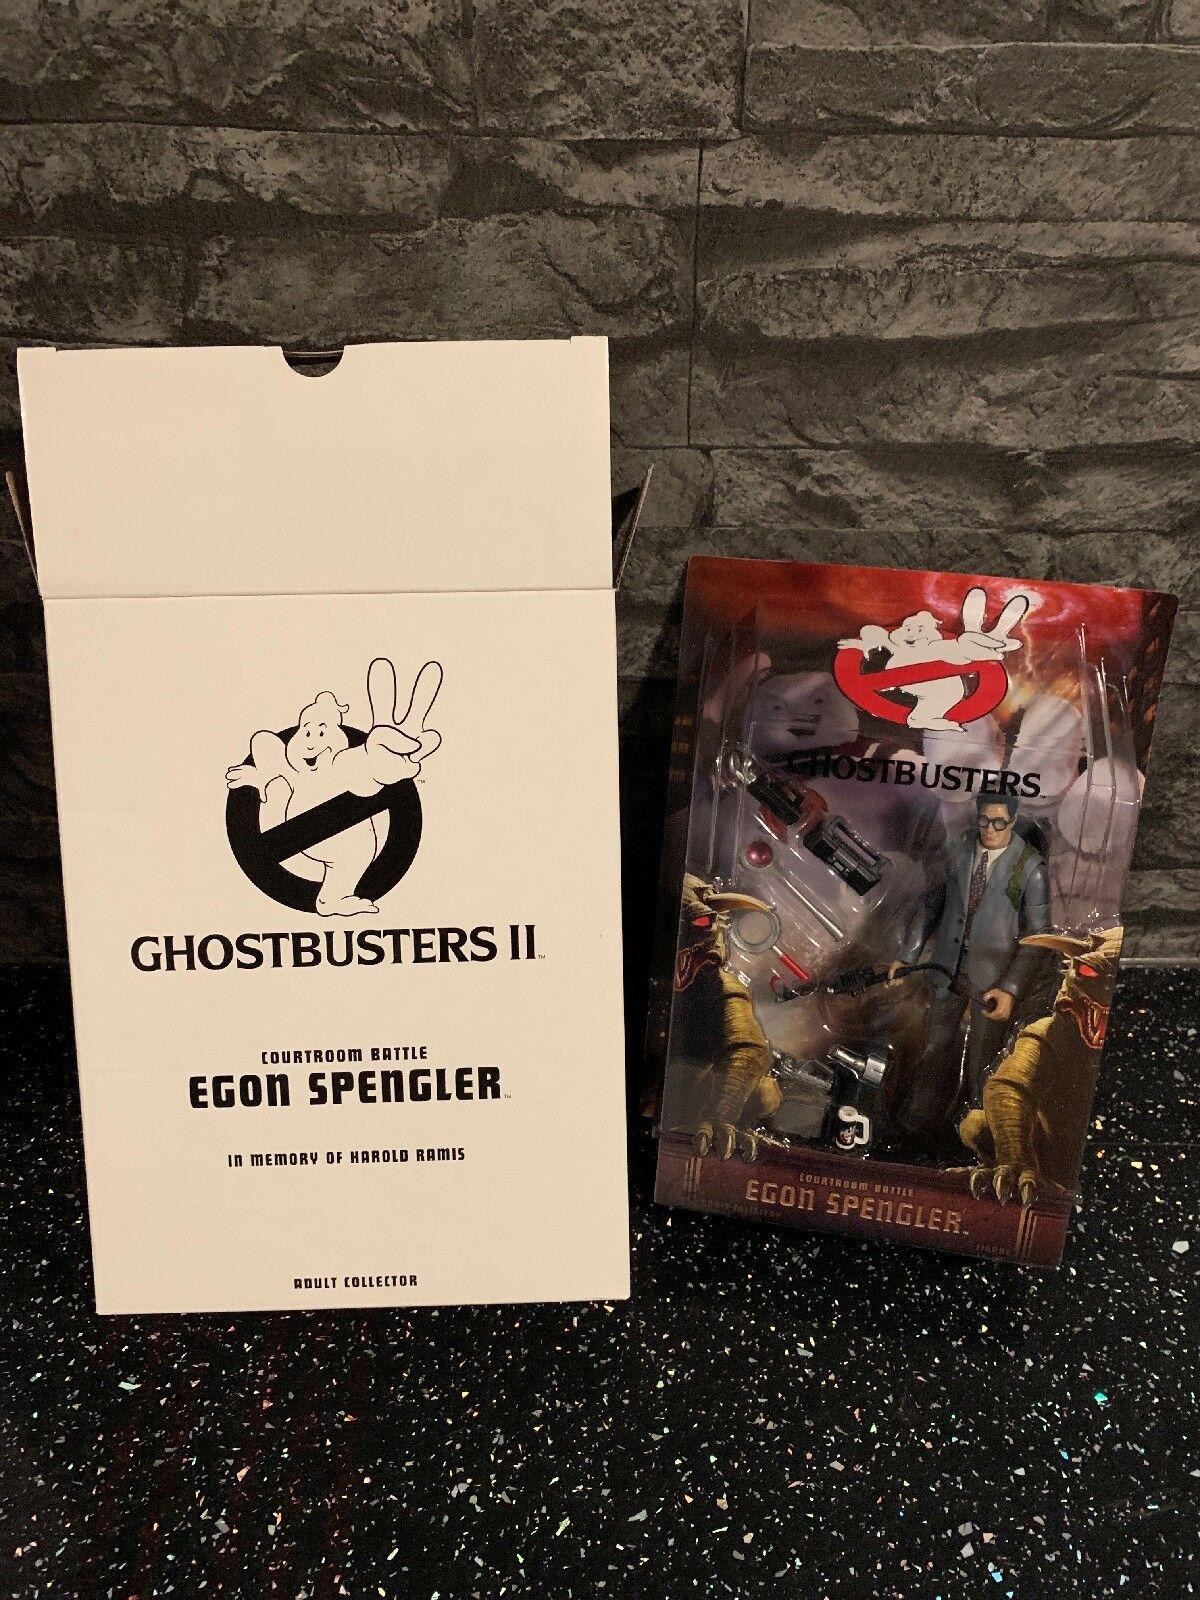 Matty Collector Ghostbusters Egon Spengler Tribunal batalla coleccionista adulto NUEVO